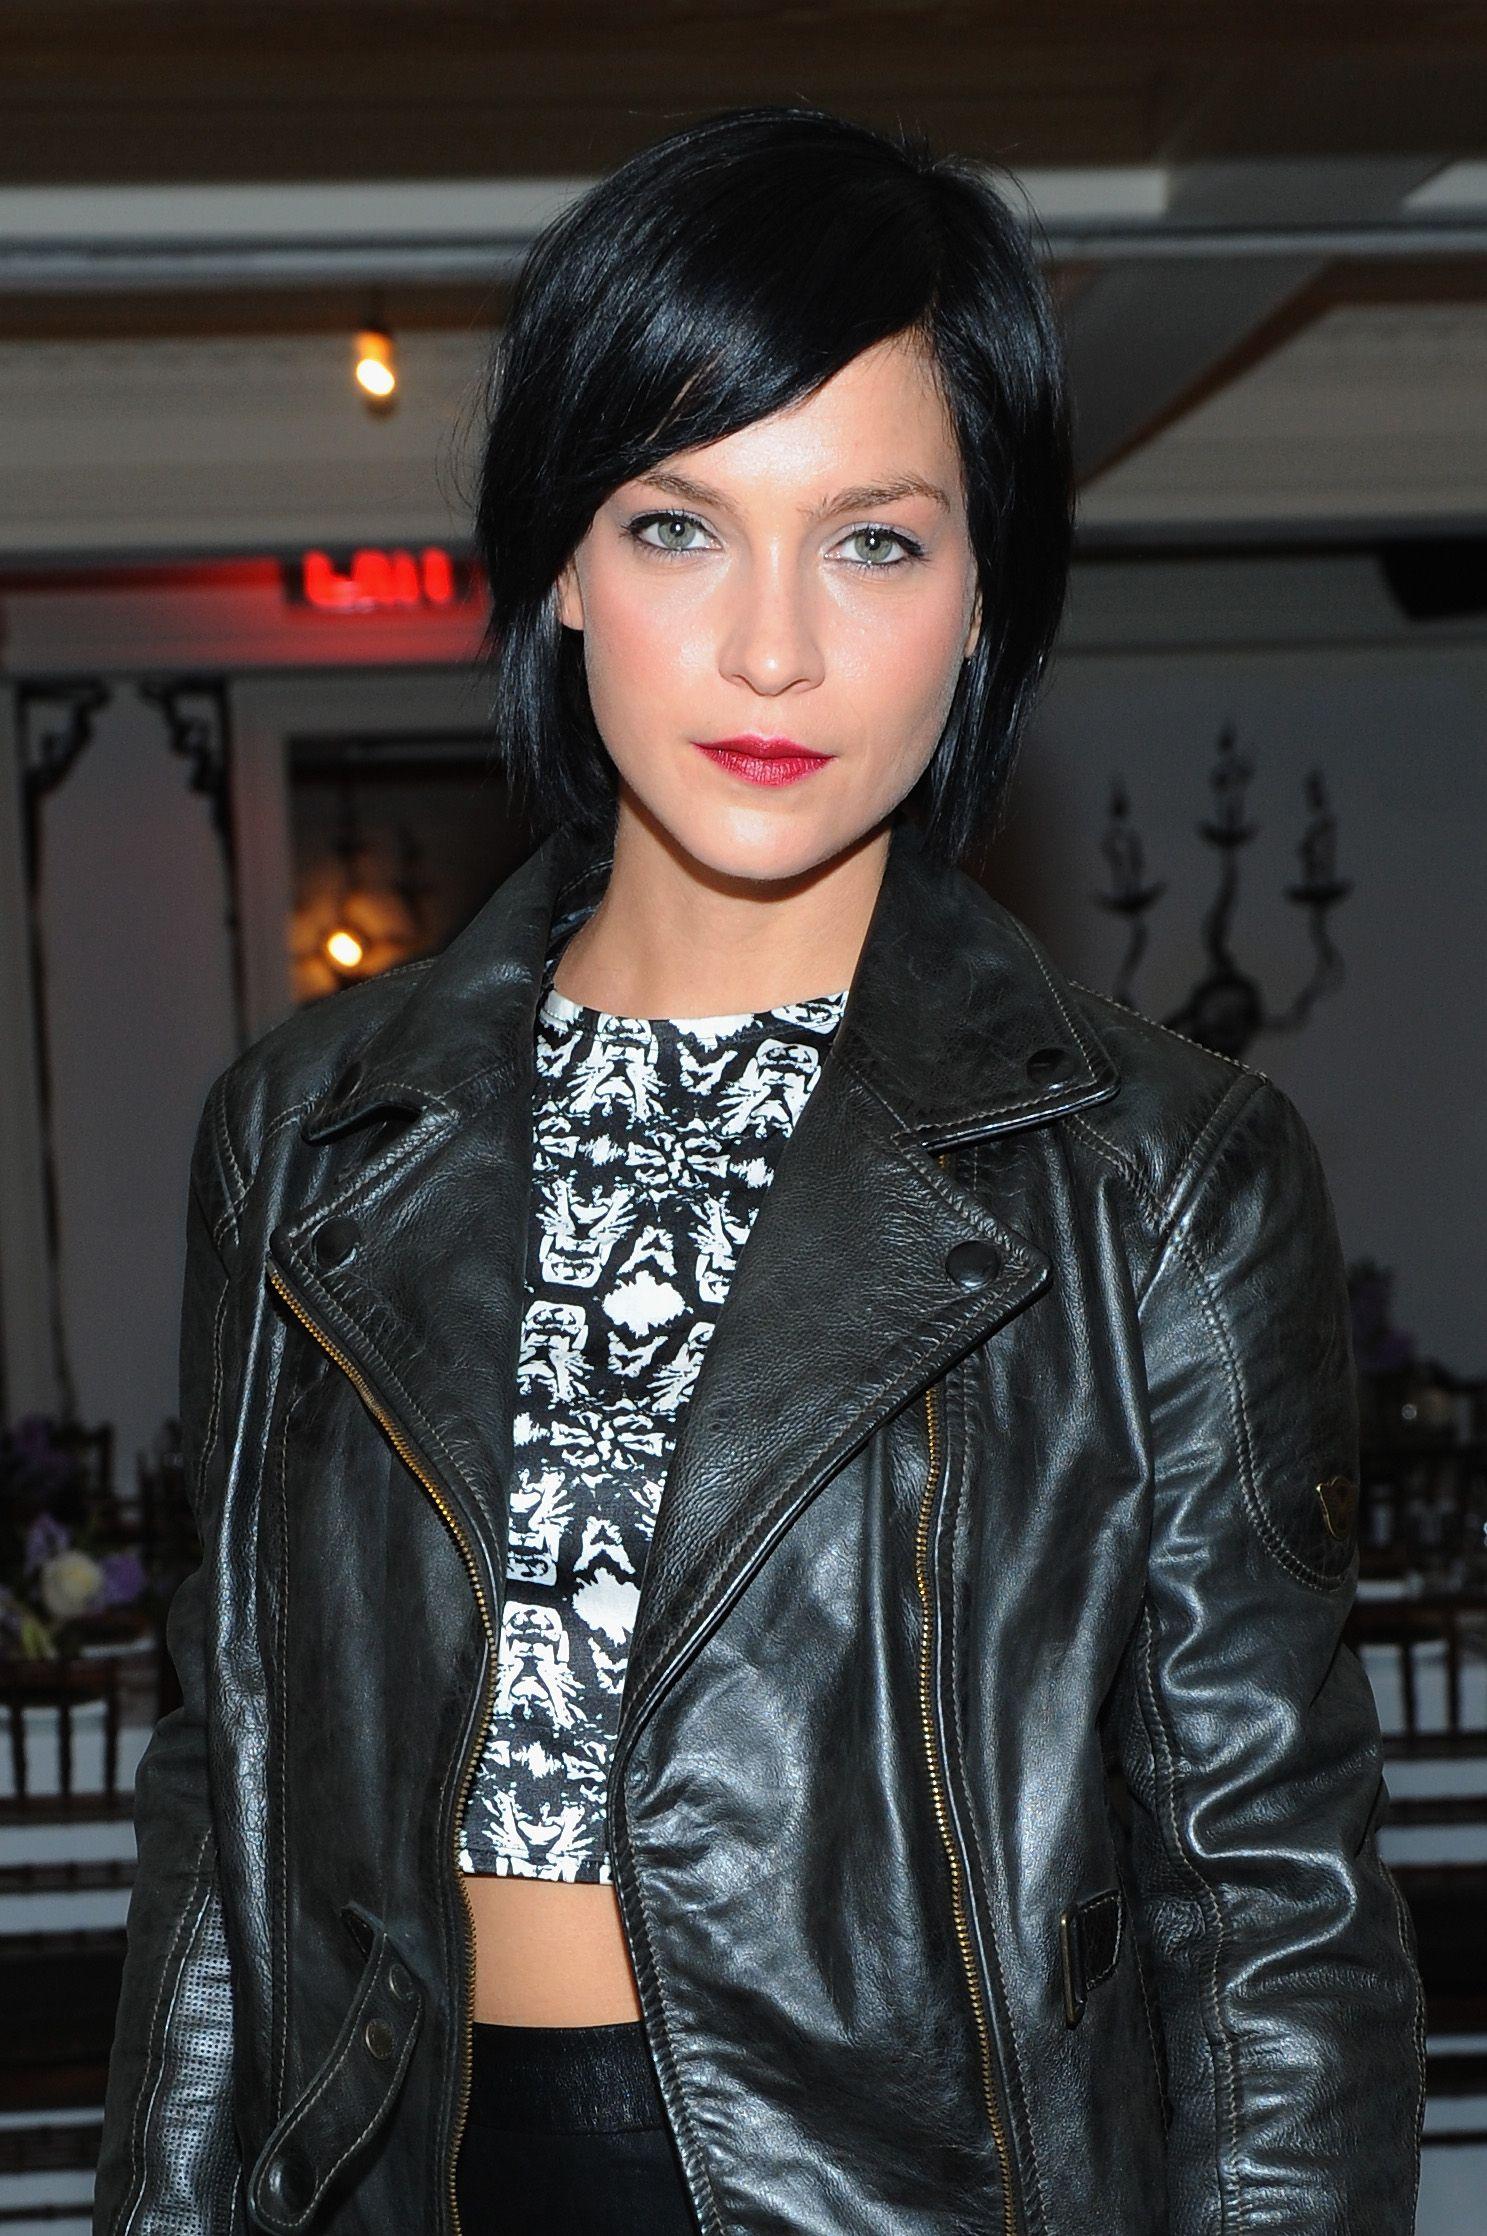 Leather jacket yahoo answers - Dj Leigh Lezark Wearing A Matchless Leather Jacket